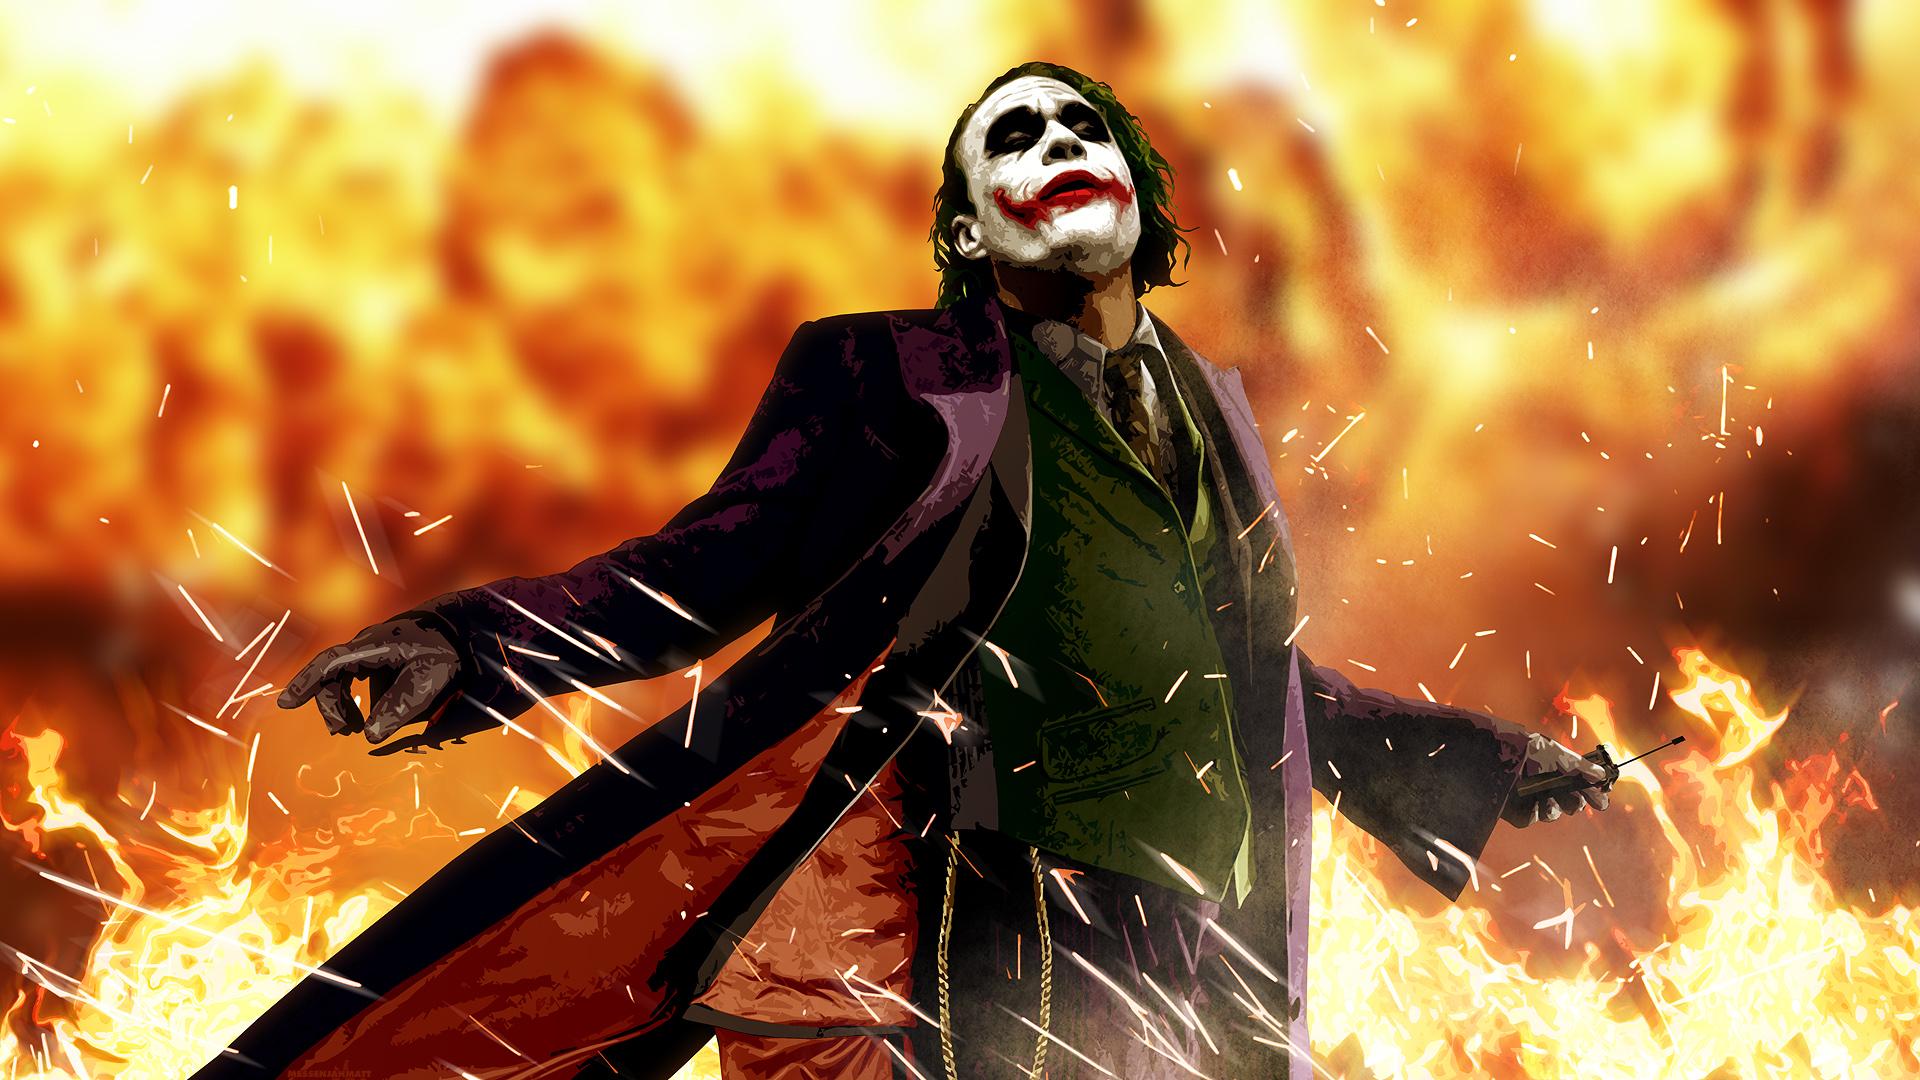 joker   The Joker Wallpaper 28092860 1920x1080